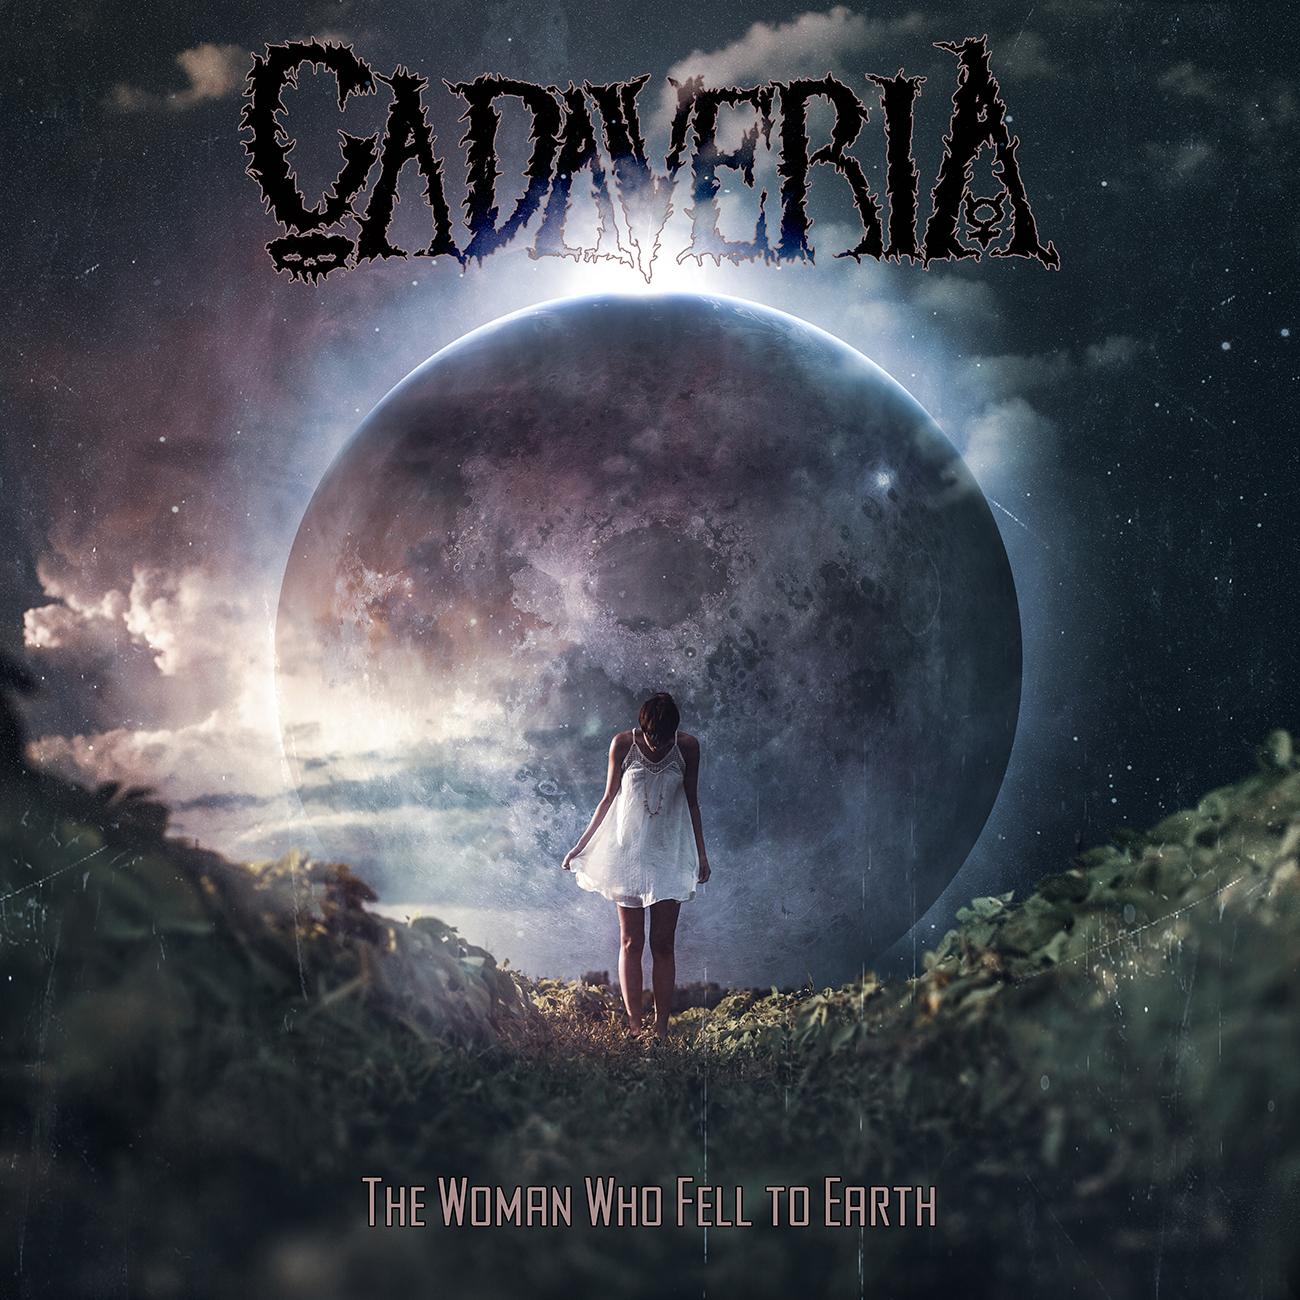 Cadaveria The Woman Who Fell to Earth